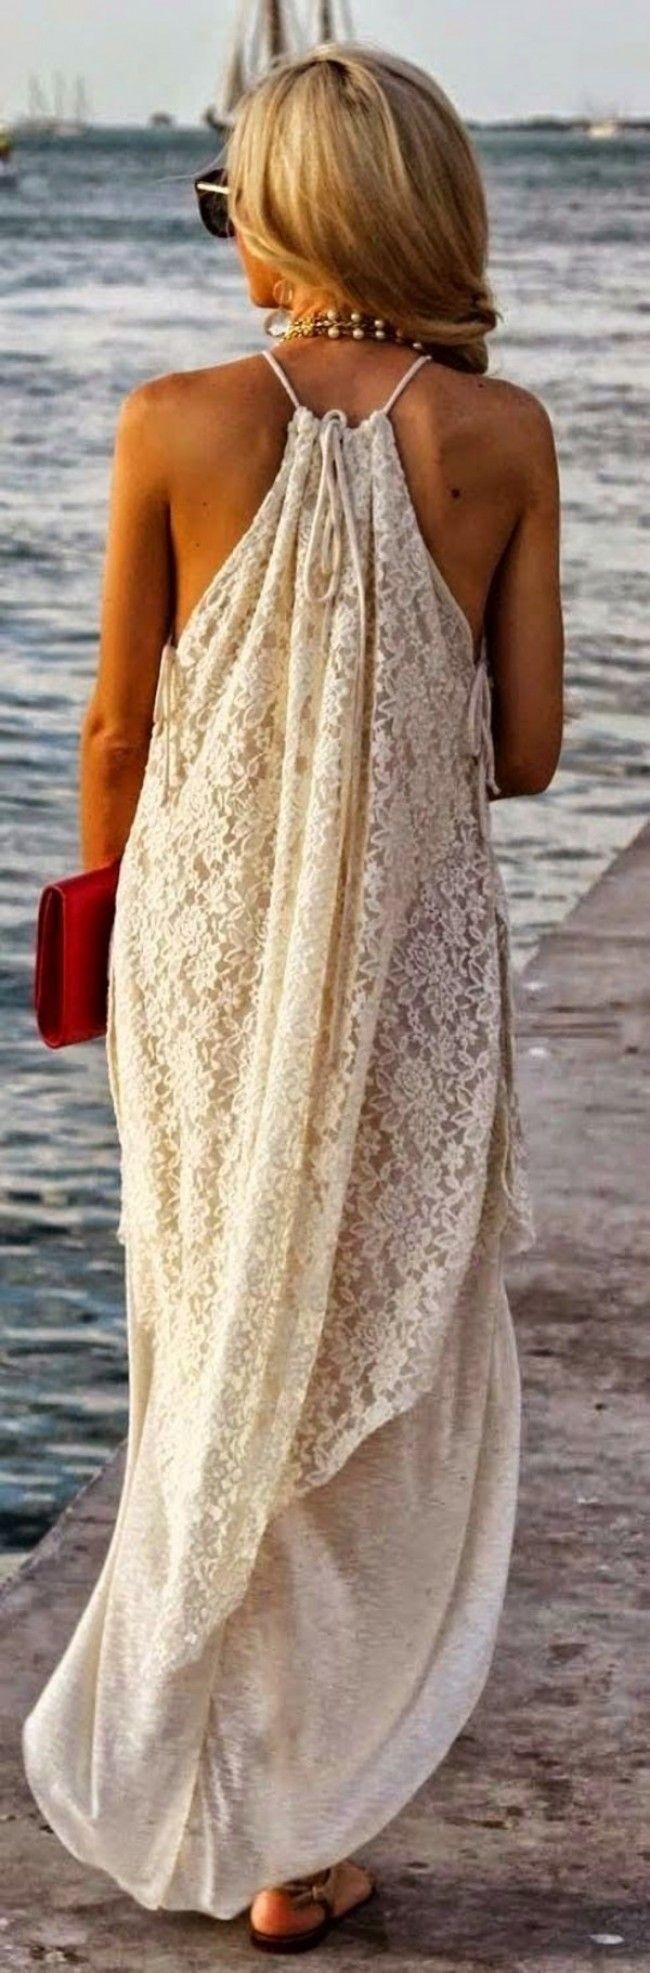 Sheer lace dress s midi boho long sleeve white scallop tunic